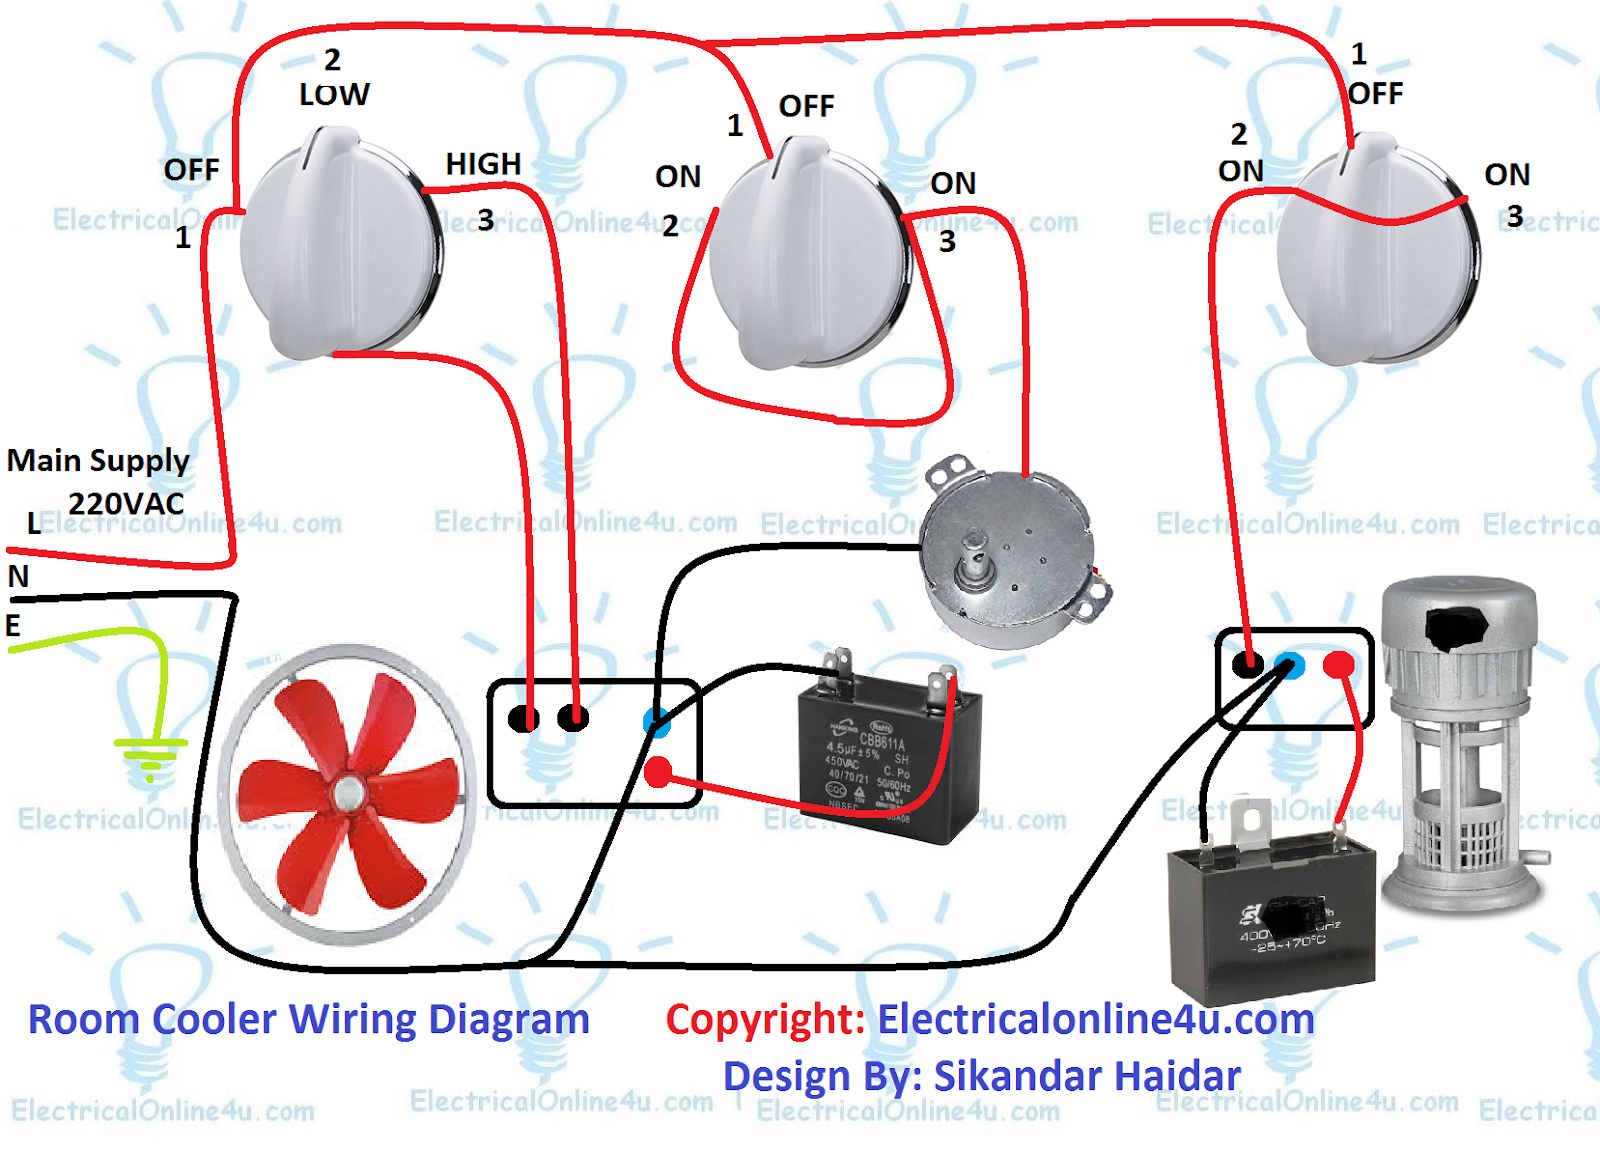 Air Room Water Cooler Wiring Diagram - Electricalonline4uElectricalonline4u